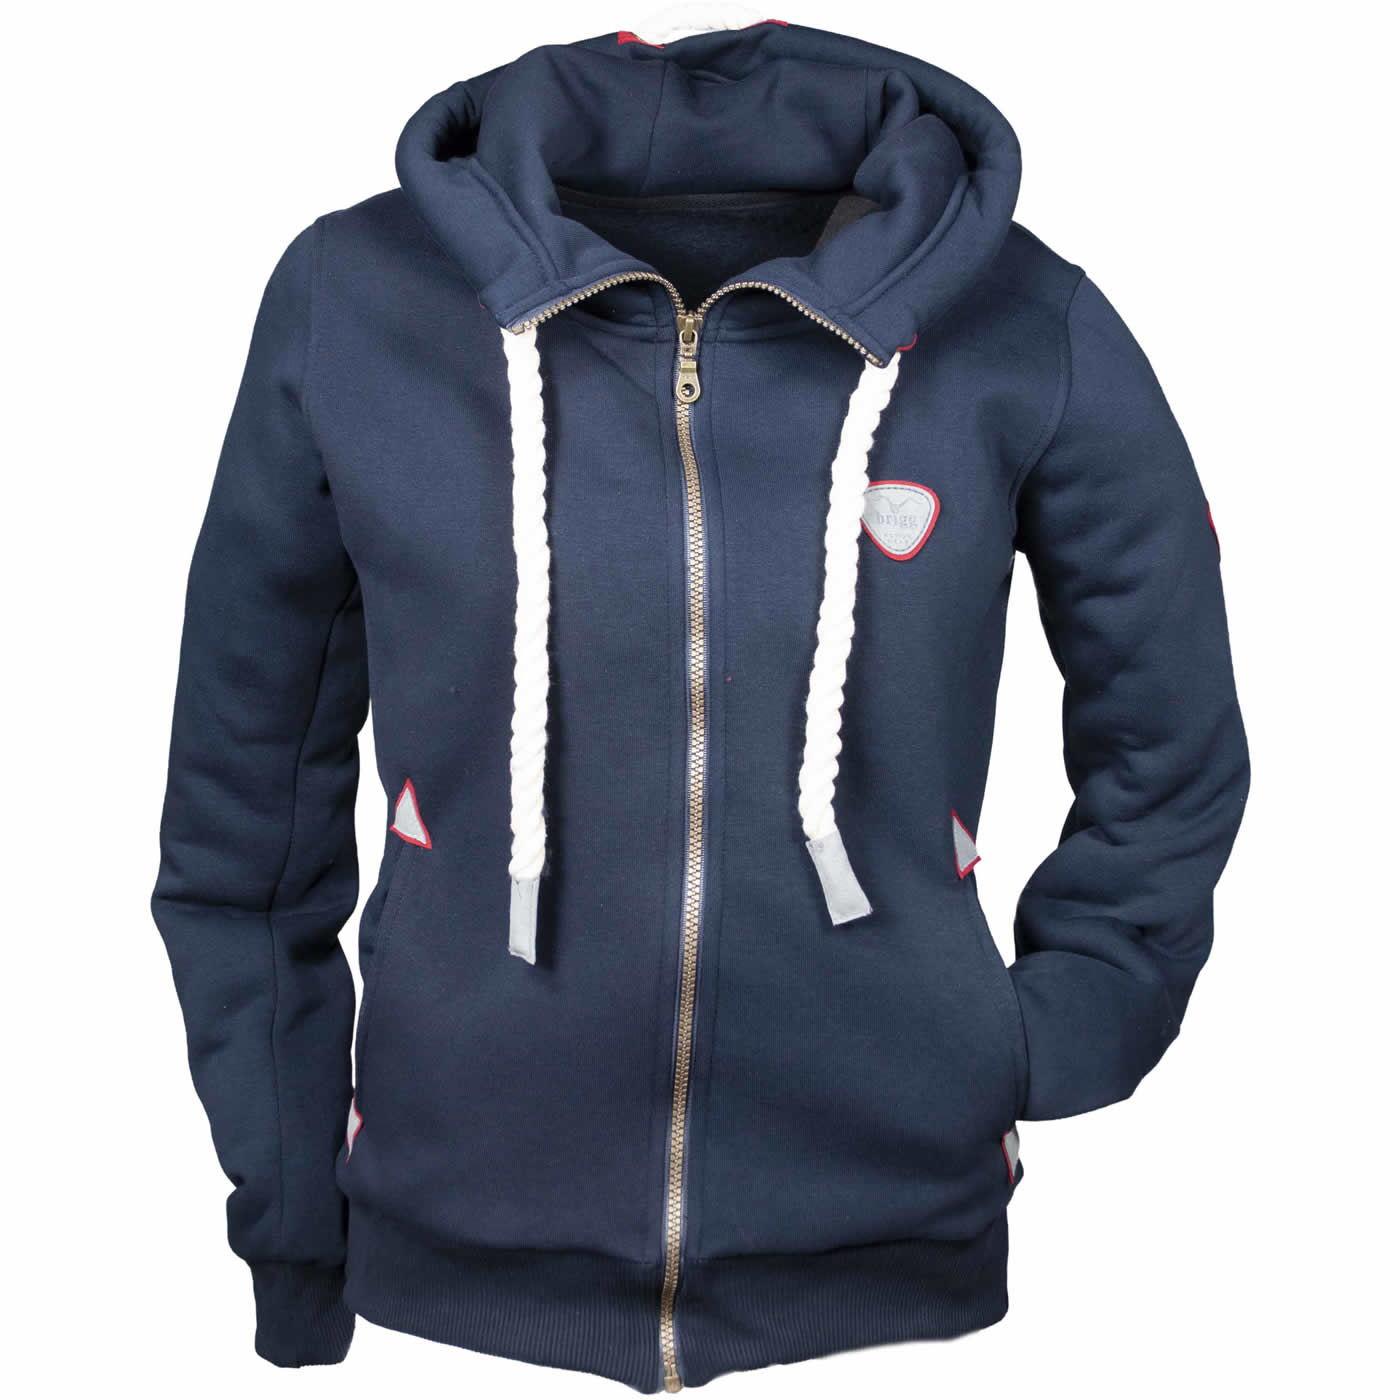 Brigg Finjara Damen Hoodie Sweatshirt Jacke Reißverschluss